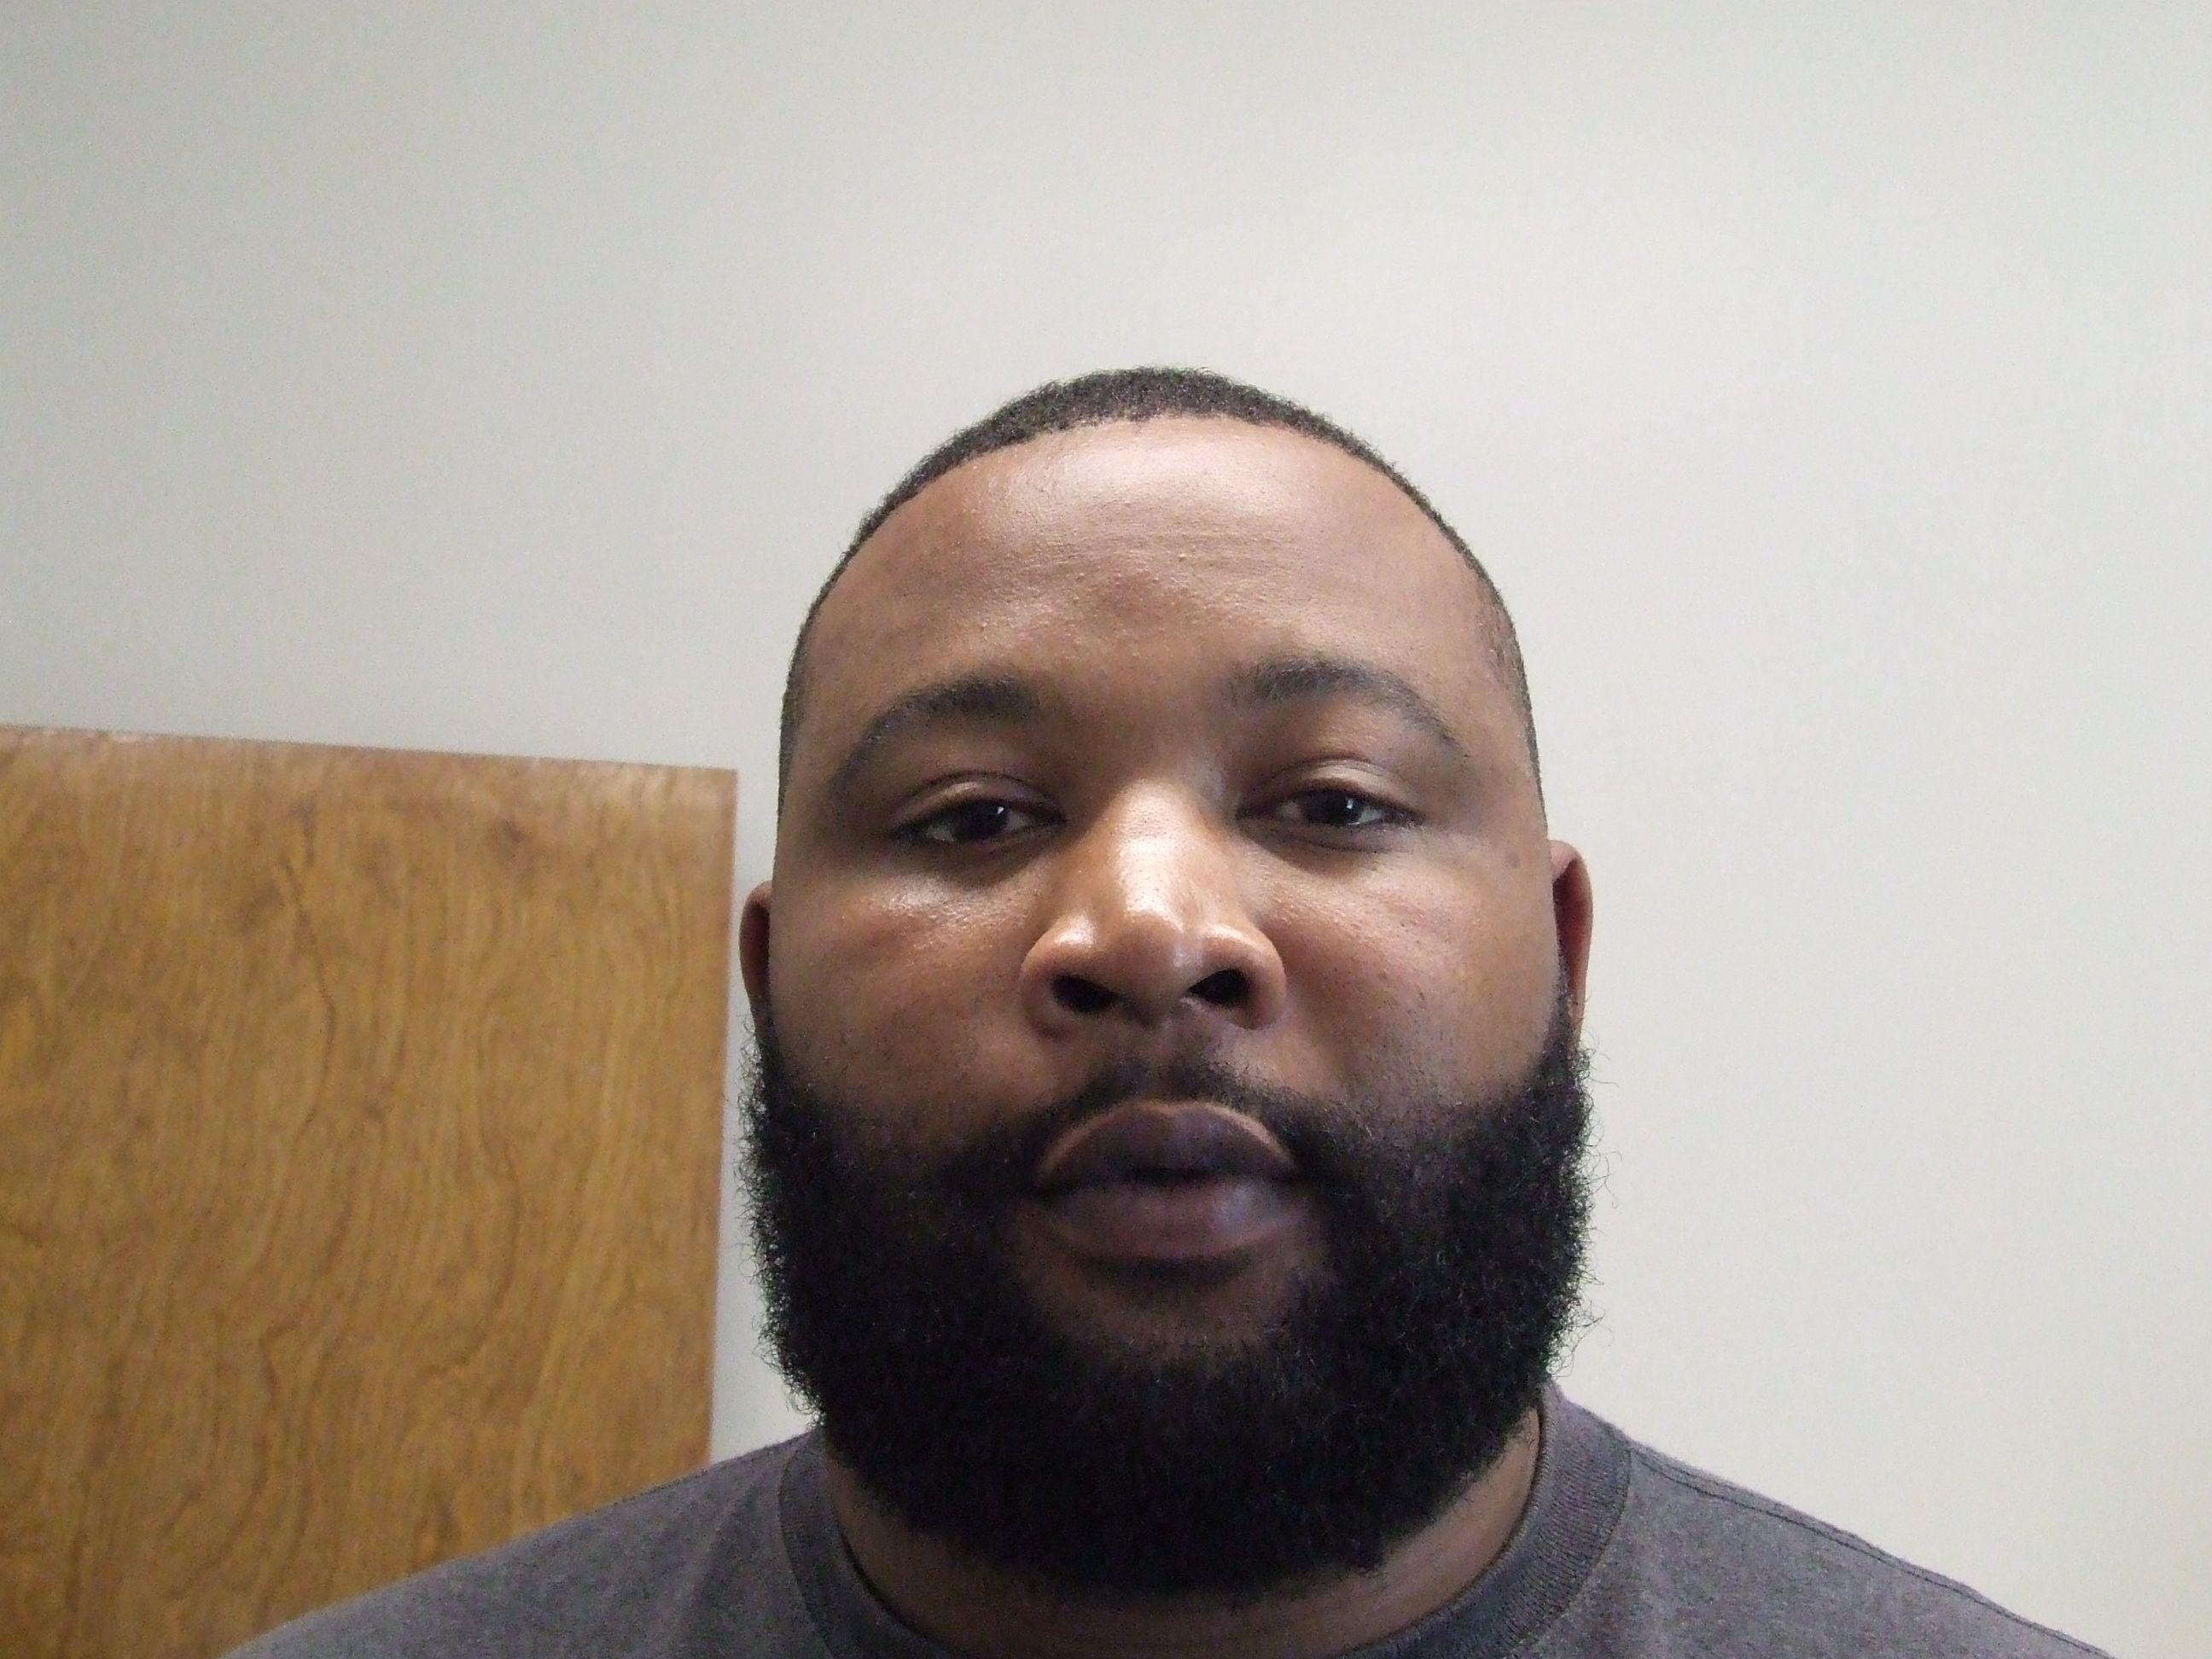 Bibb county ga sex offender